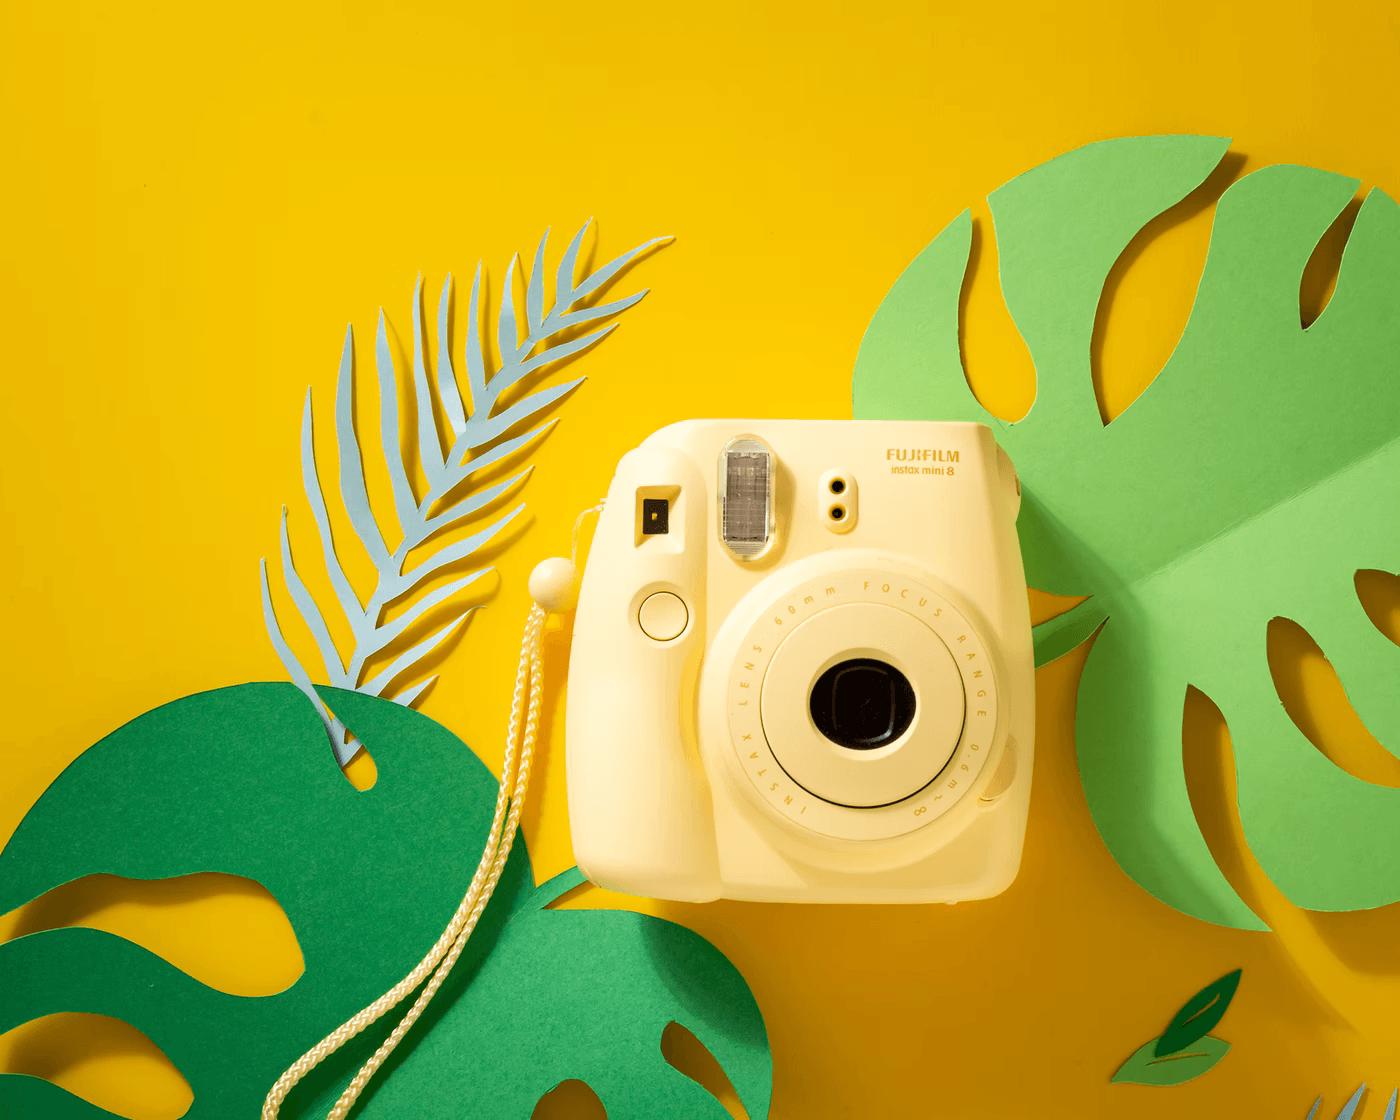 yellow camera om yellow background product idea